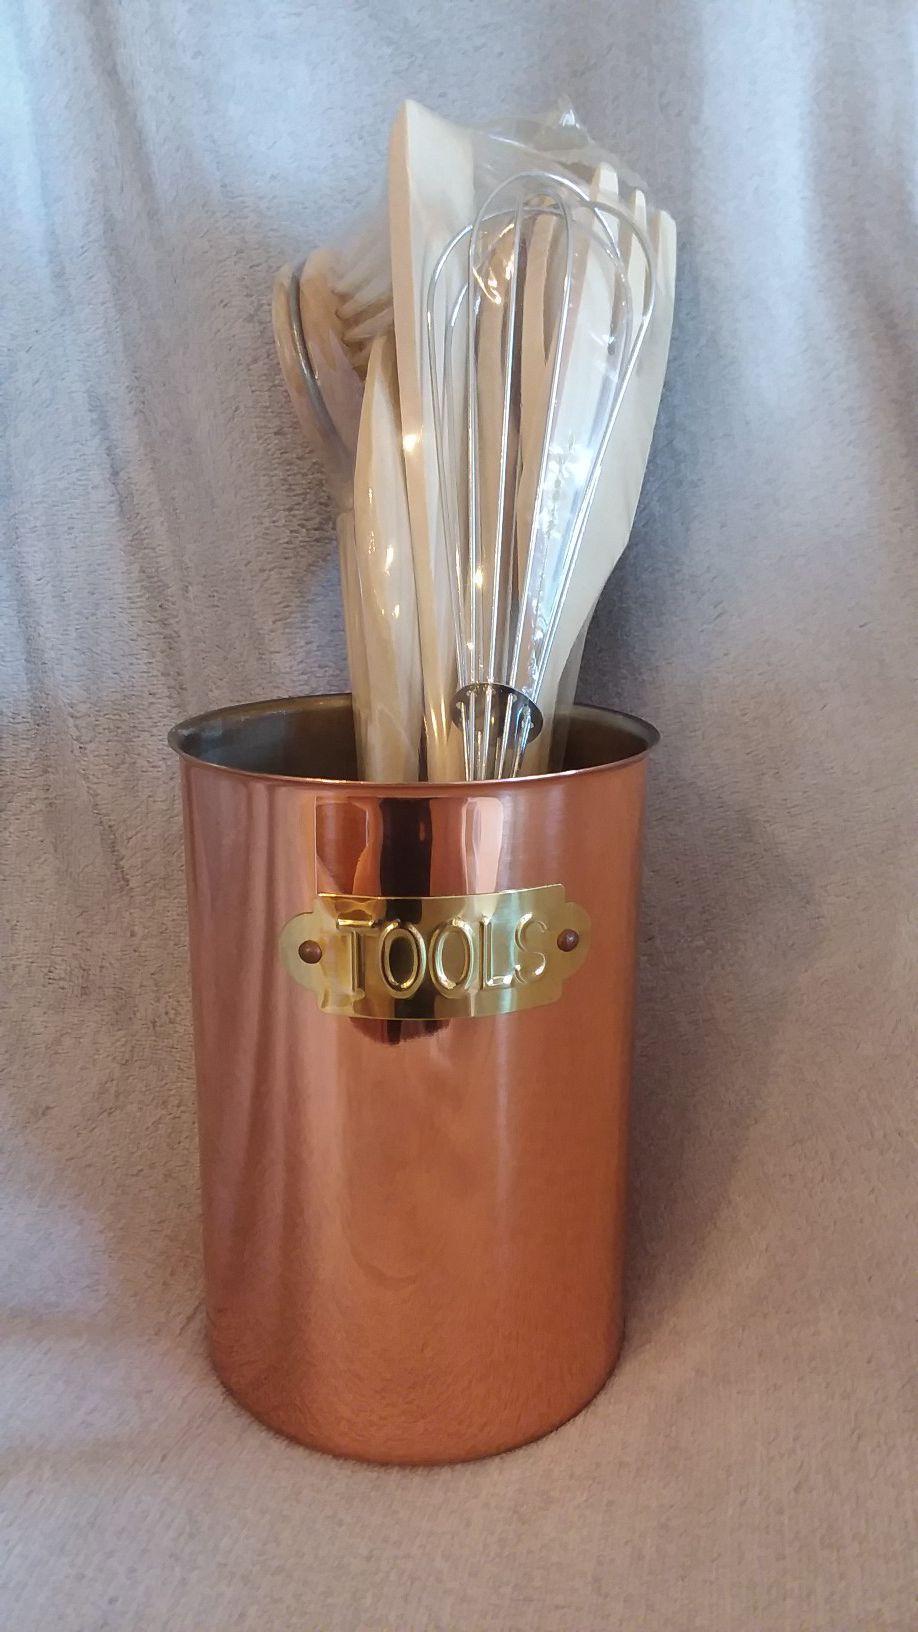 New In Box- Old Dutch Copper Tool Utensil Caddy